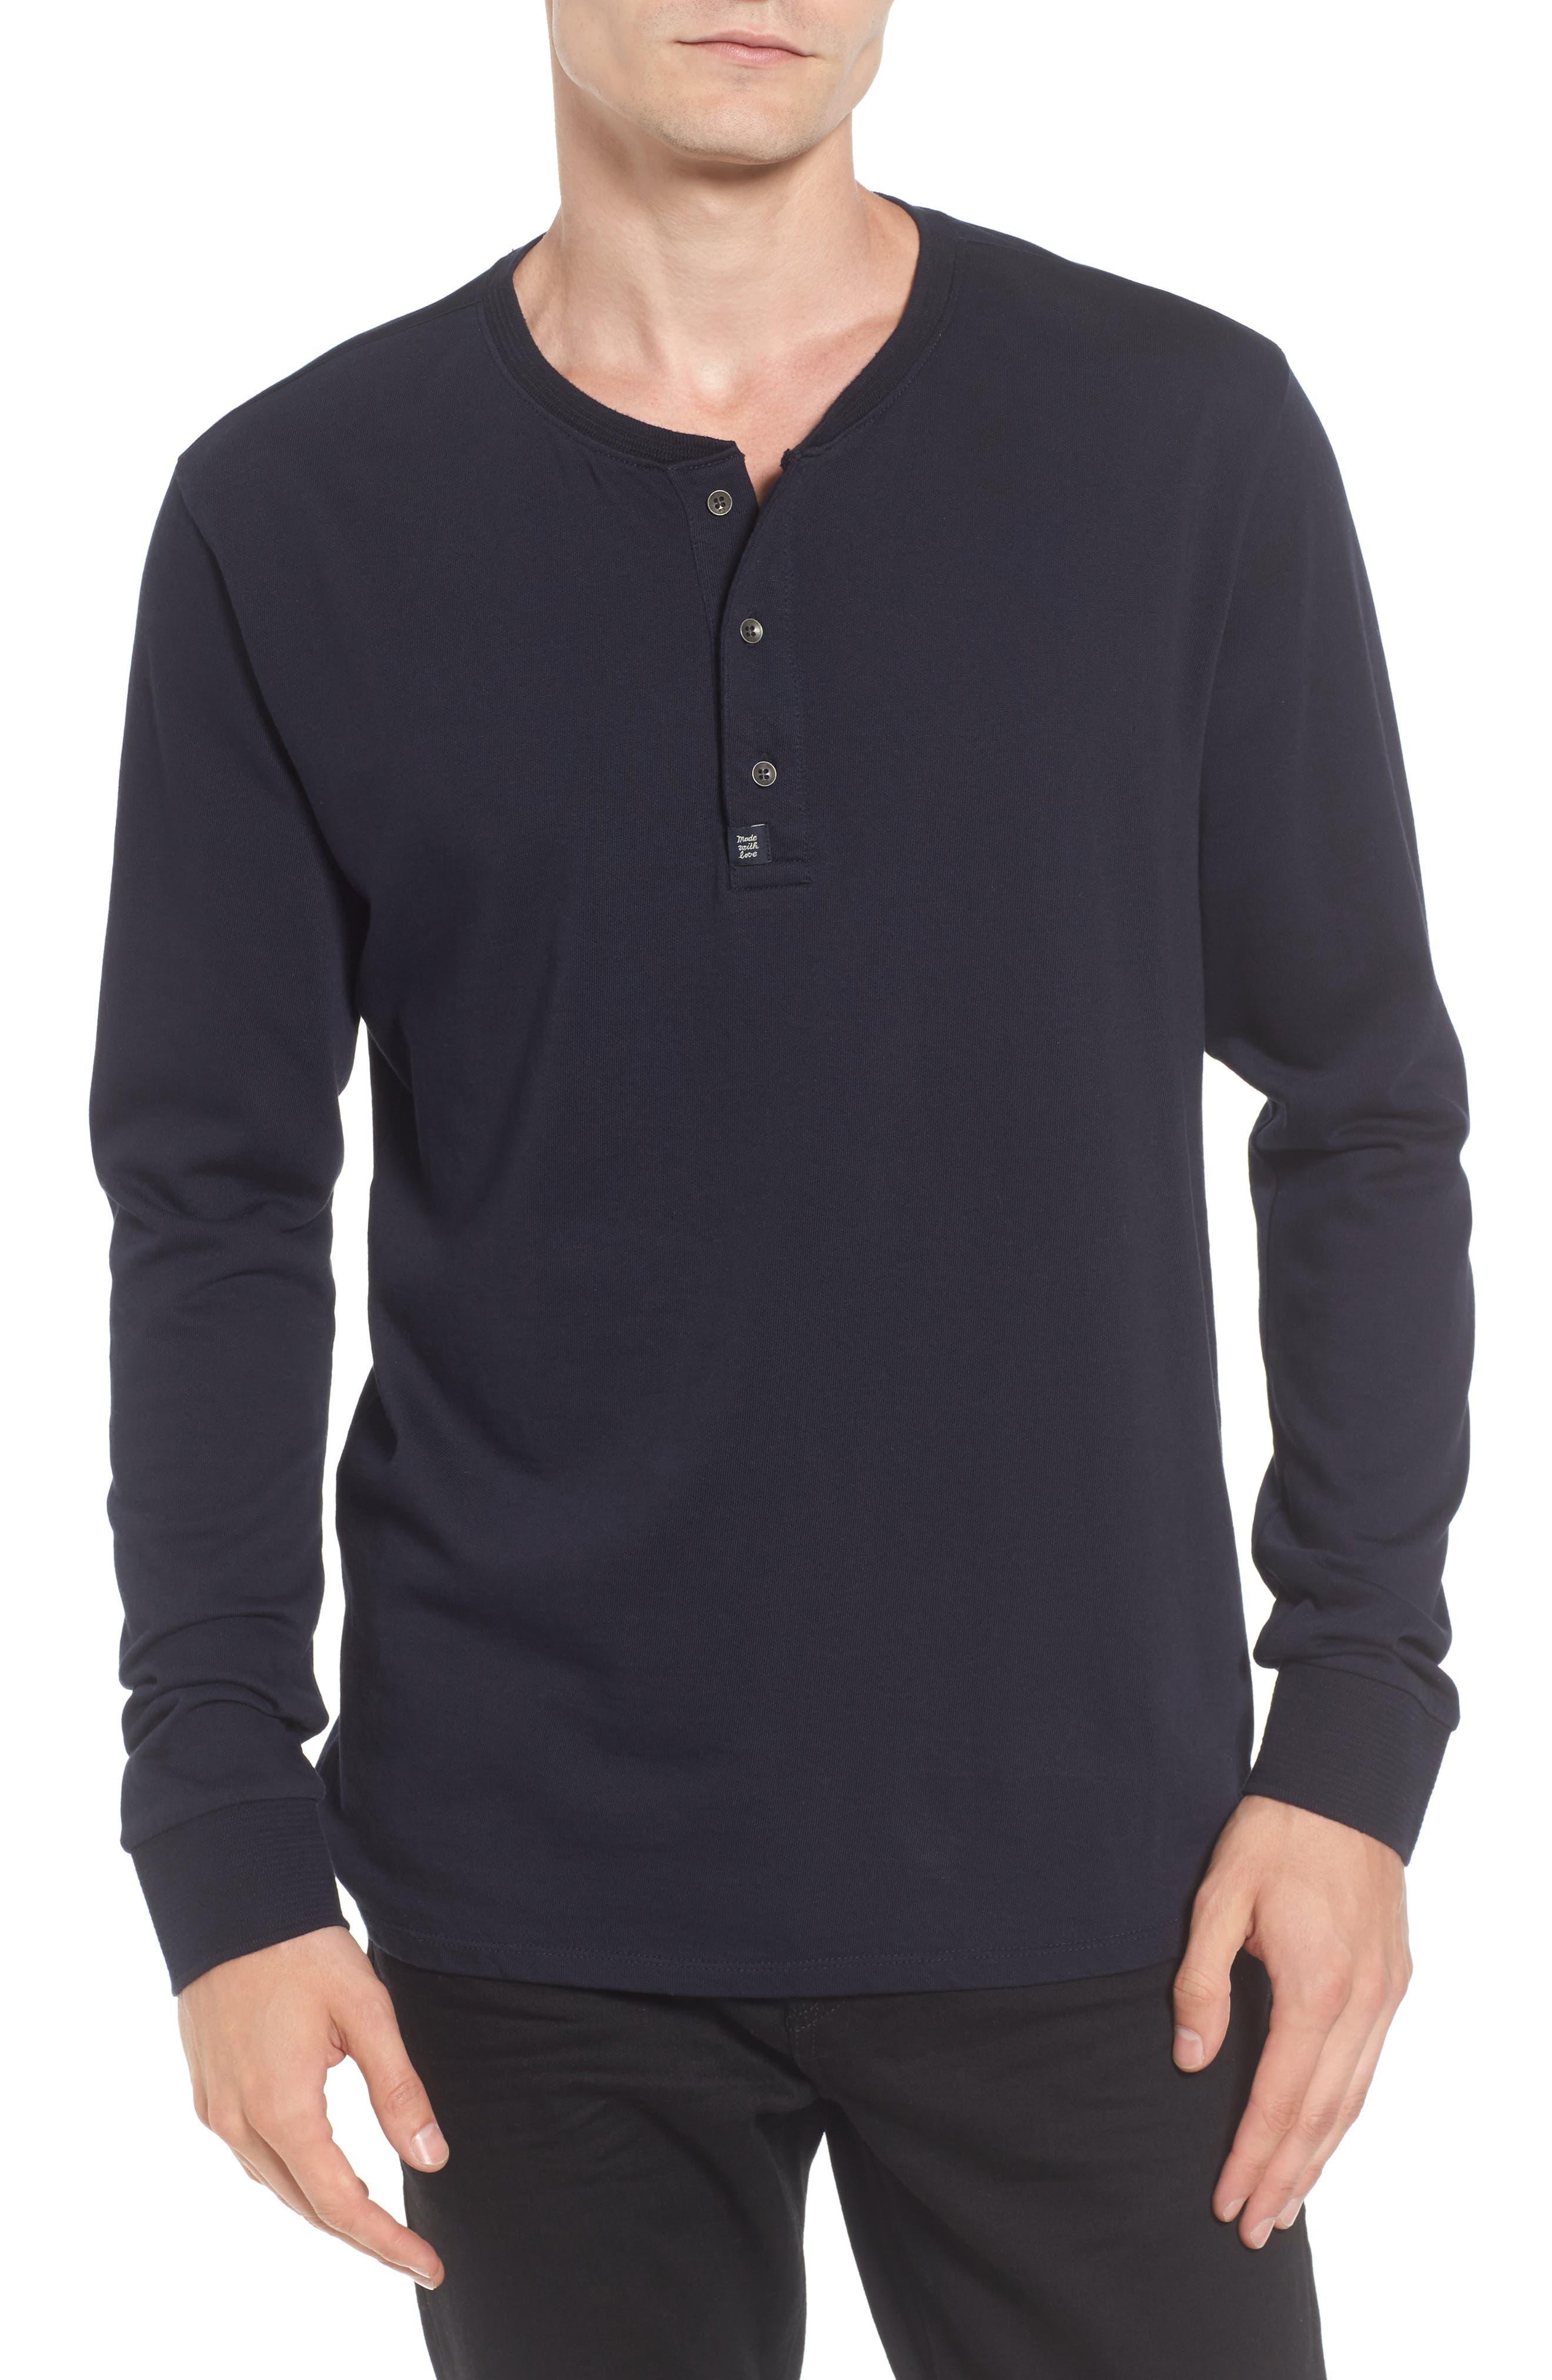 Main Image - Scotch & Soda Grandad Henley T-Shirt